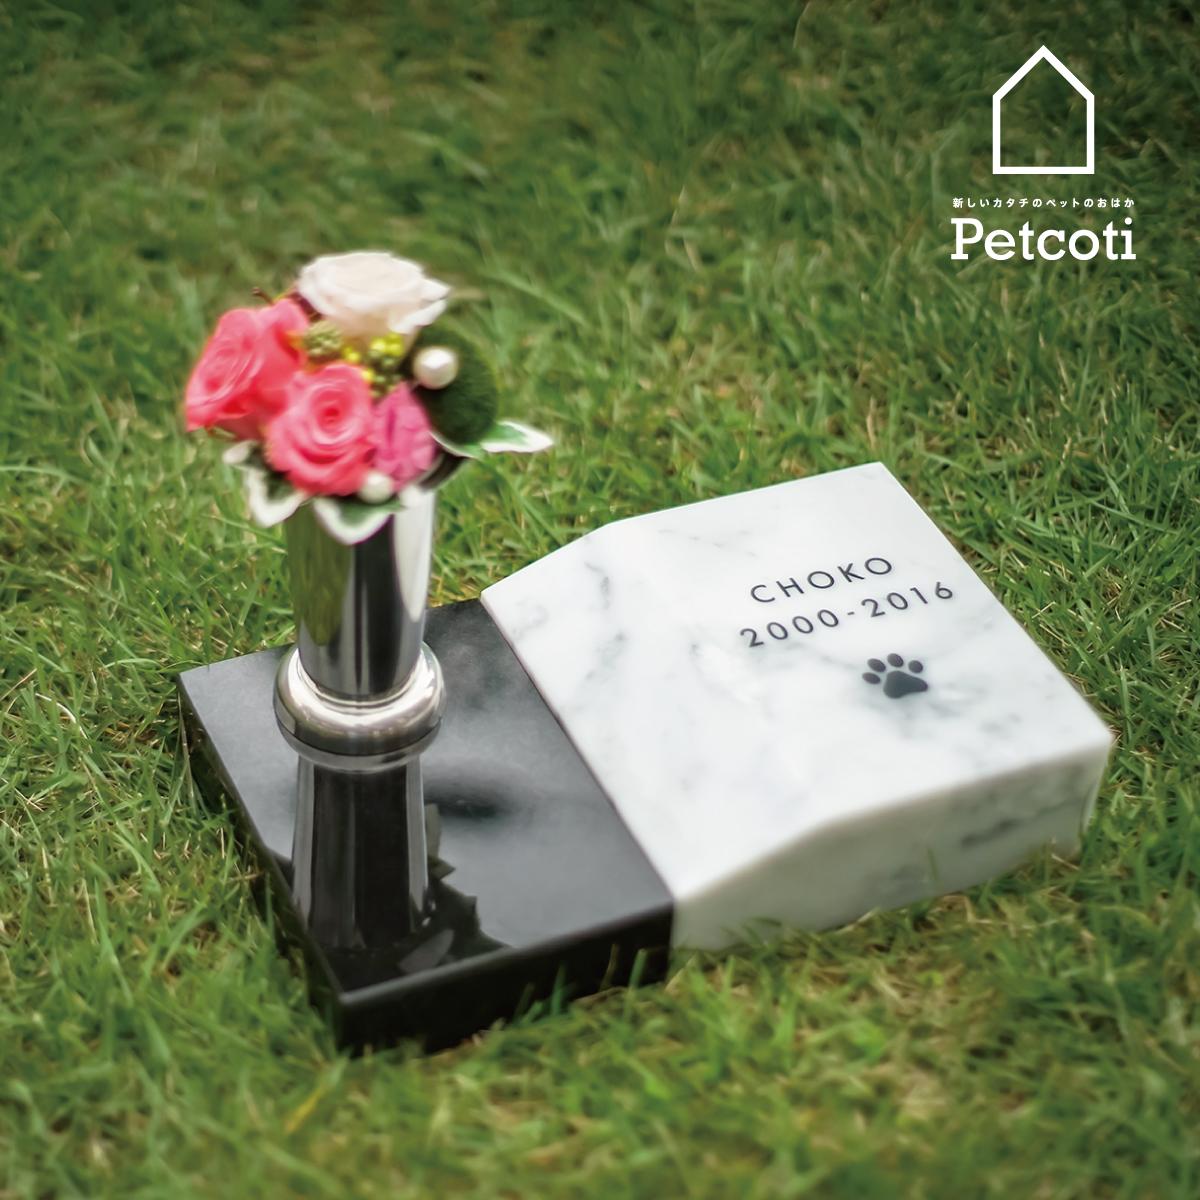 Dan-ishi 段石 本体:大理石Petcoti ペットコティペットのお墓 手元供養 花立 メモリアル ペットロス癒し お盆 お彼岸